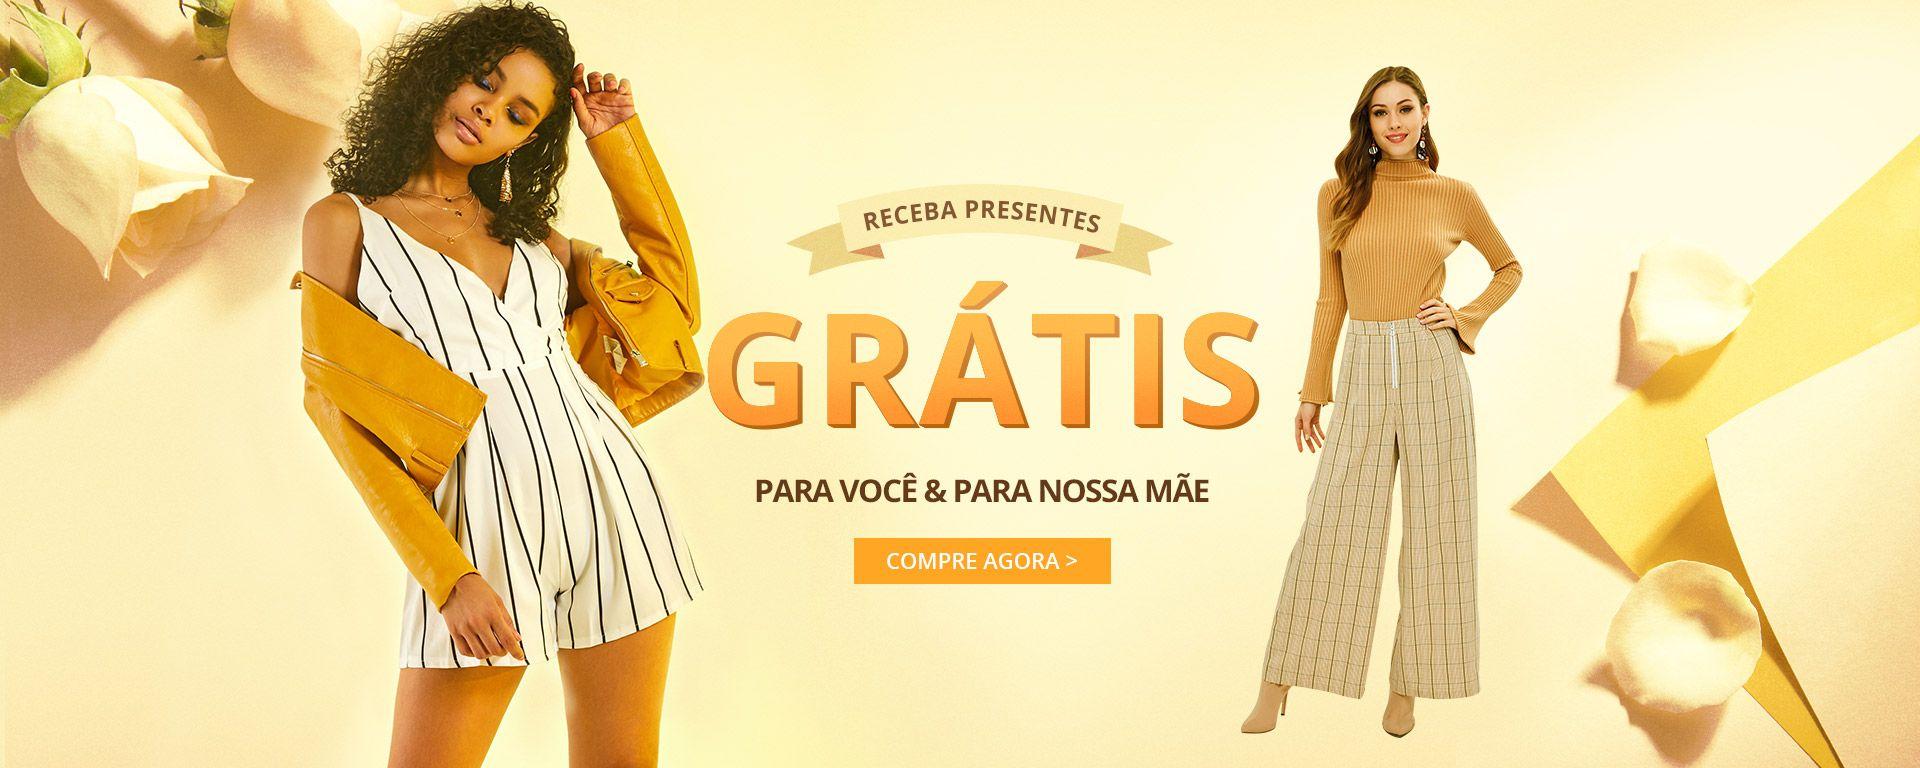 afe70a1c64 ZAFUL Brasil:Tendências Da Moda de Roupas Femininas Compras on-line